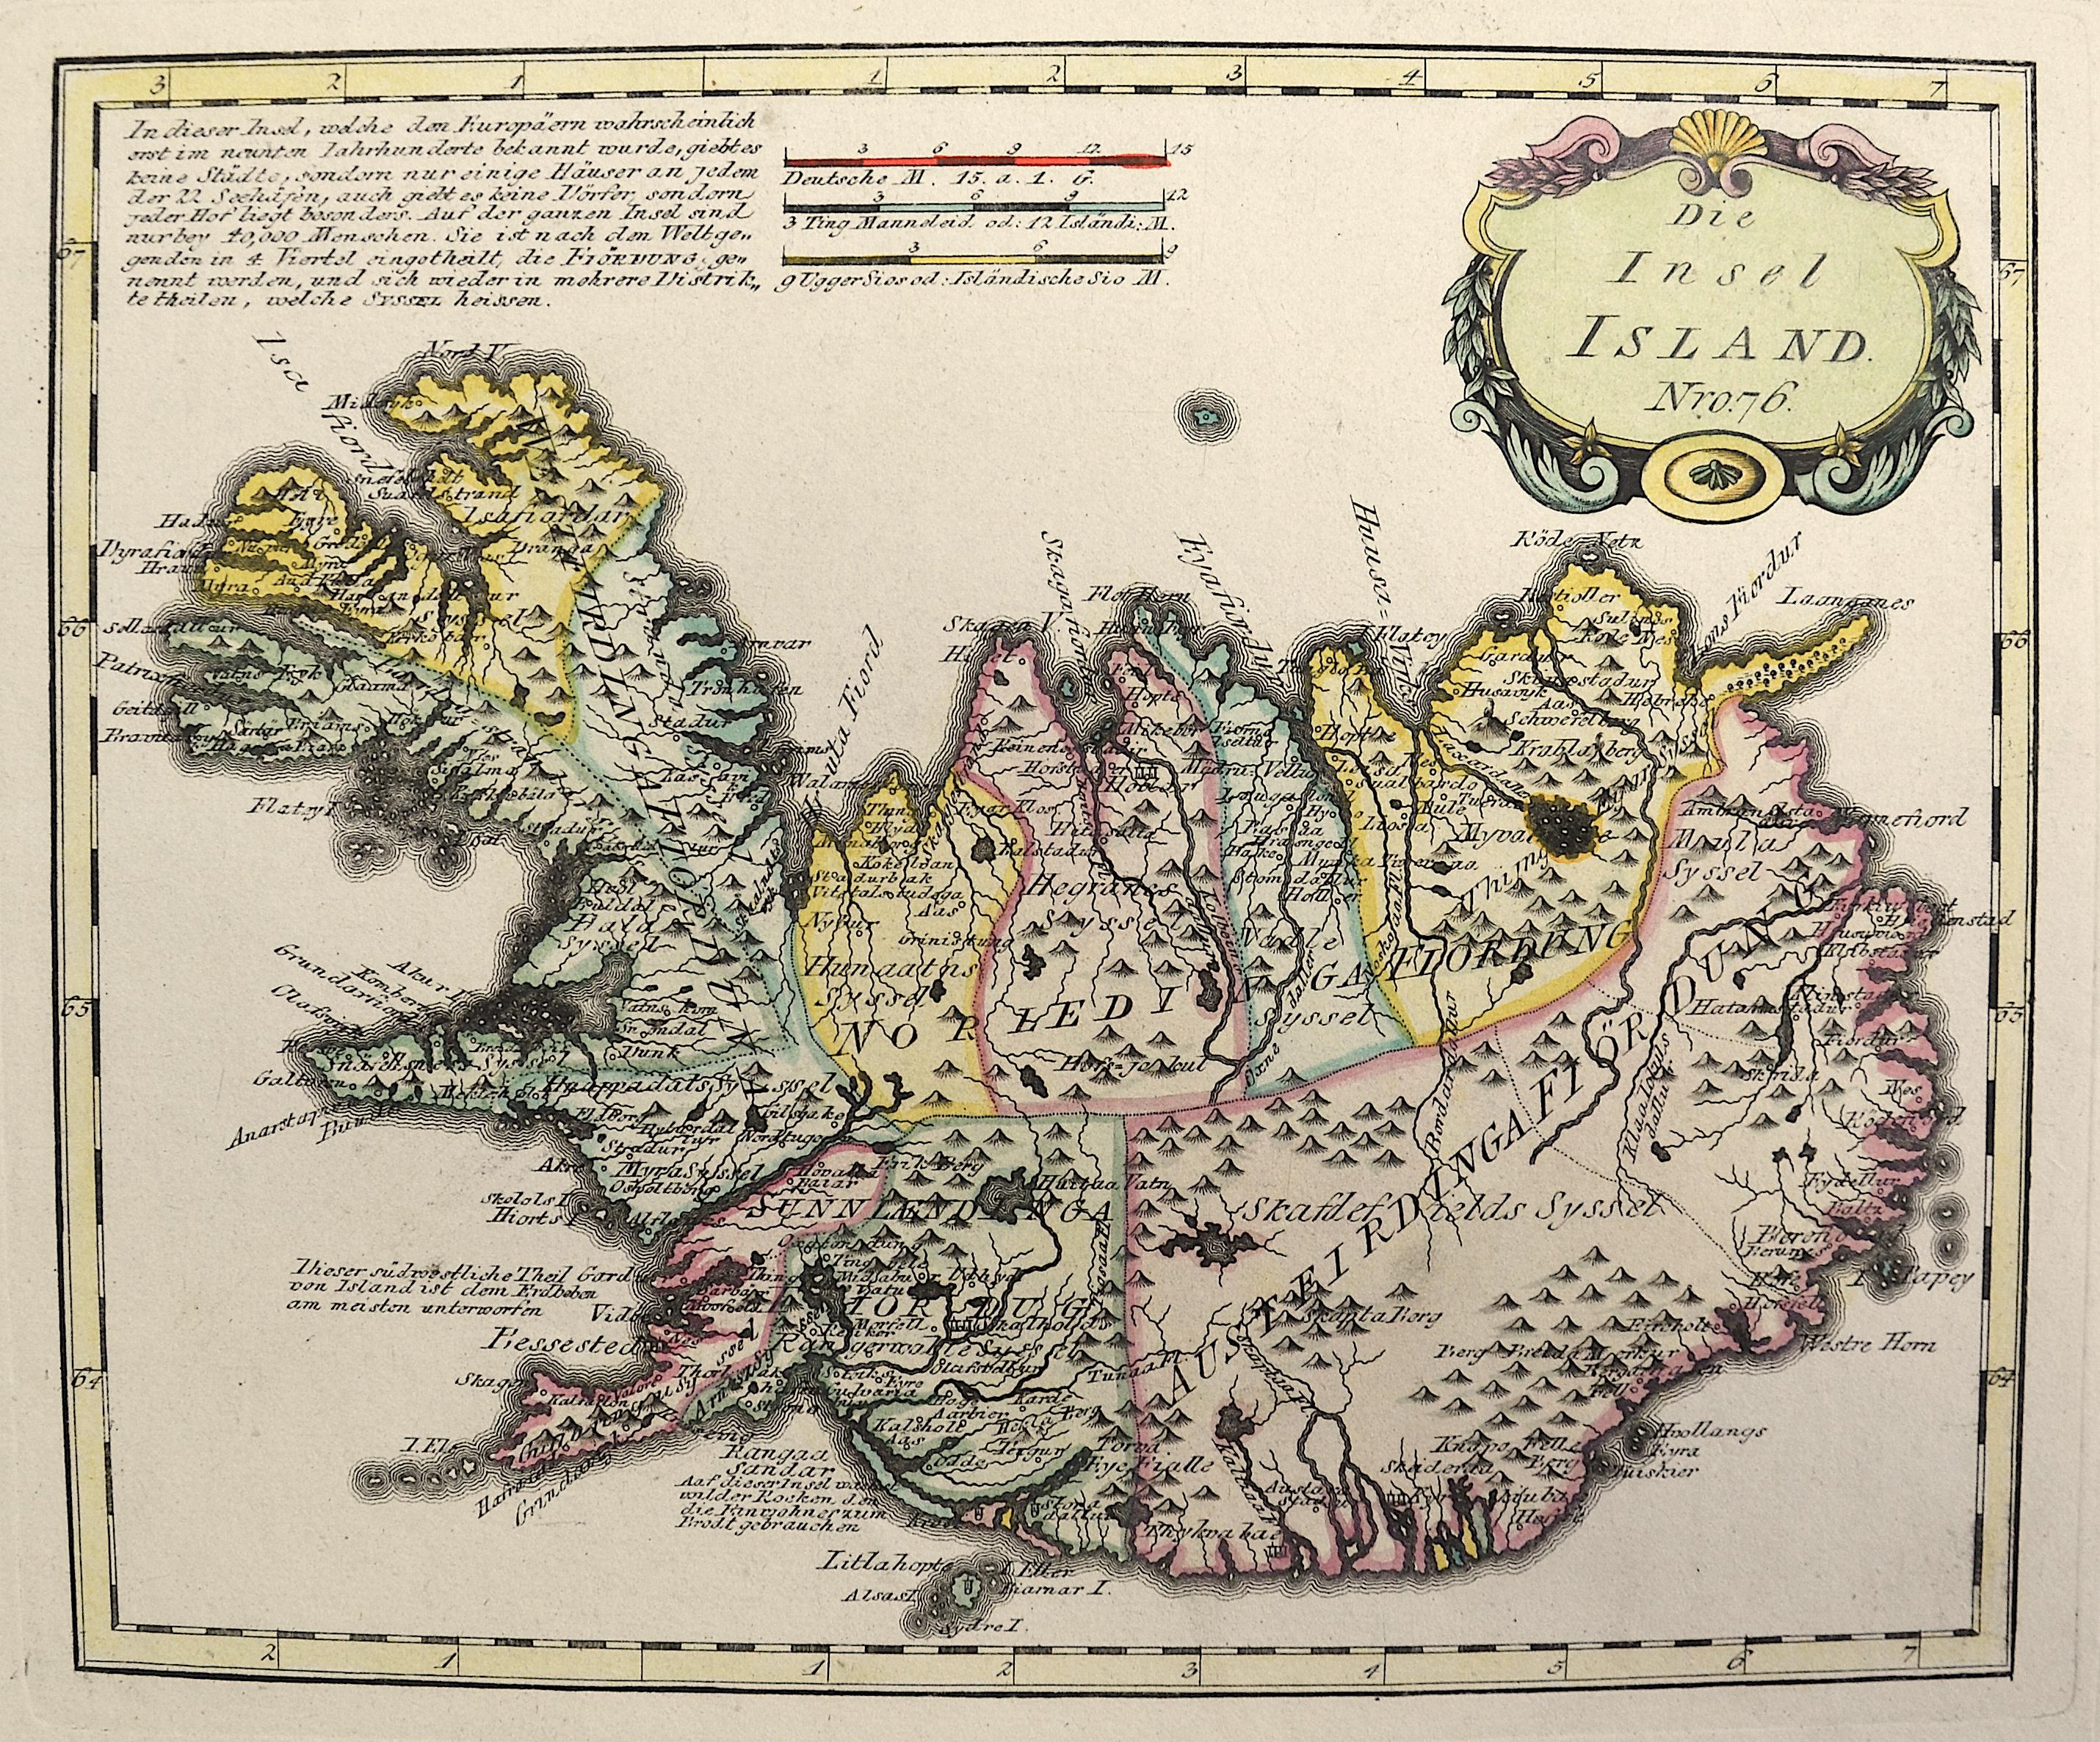 Reilly Franz Johann Joseph Die Insel Island Nro. 76.